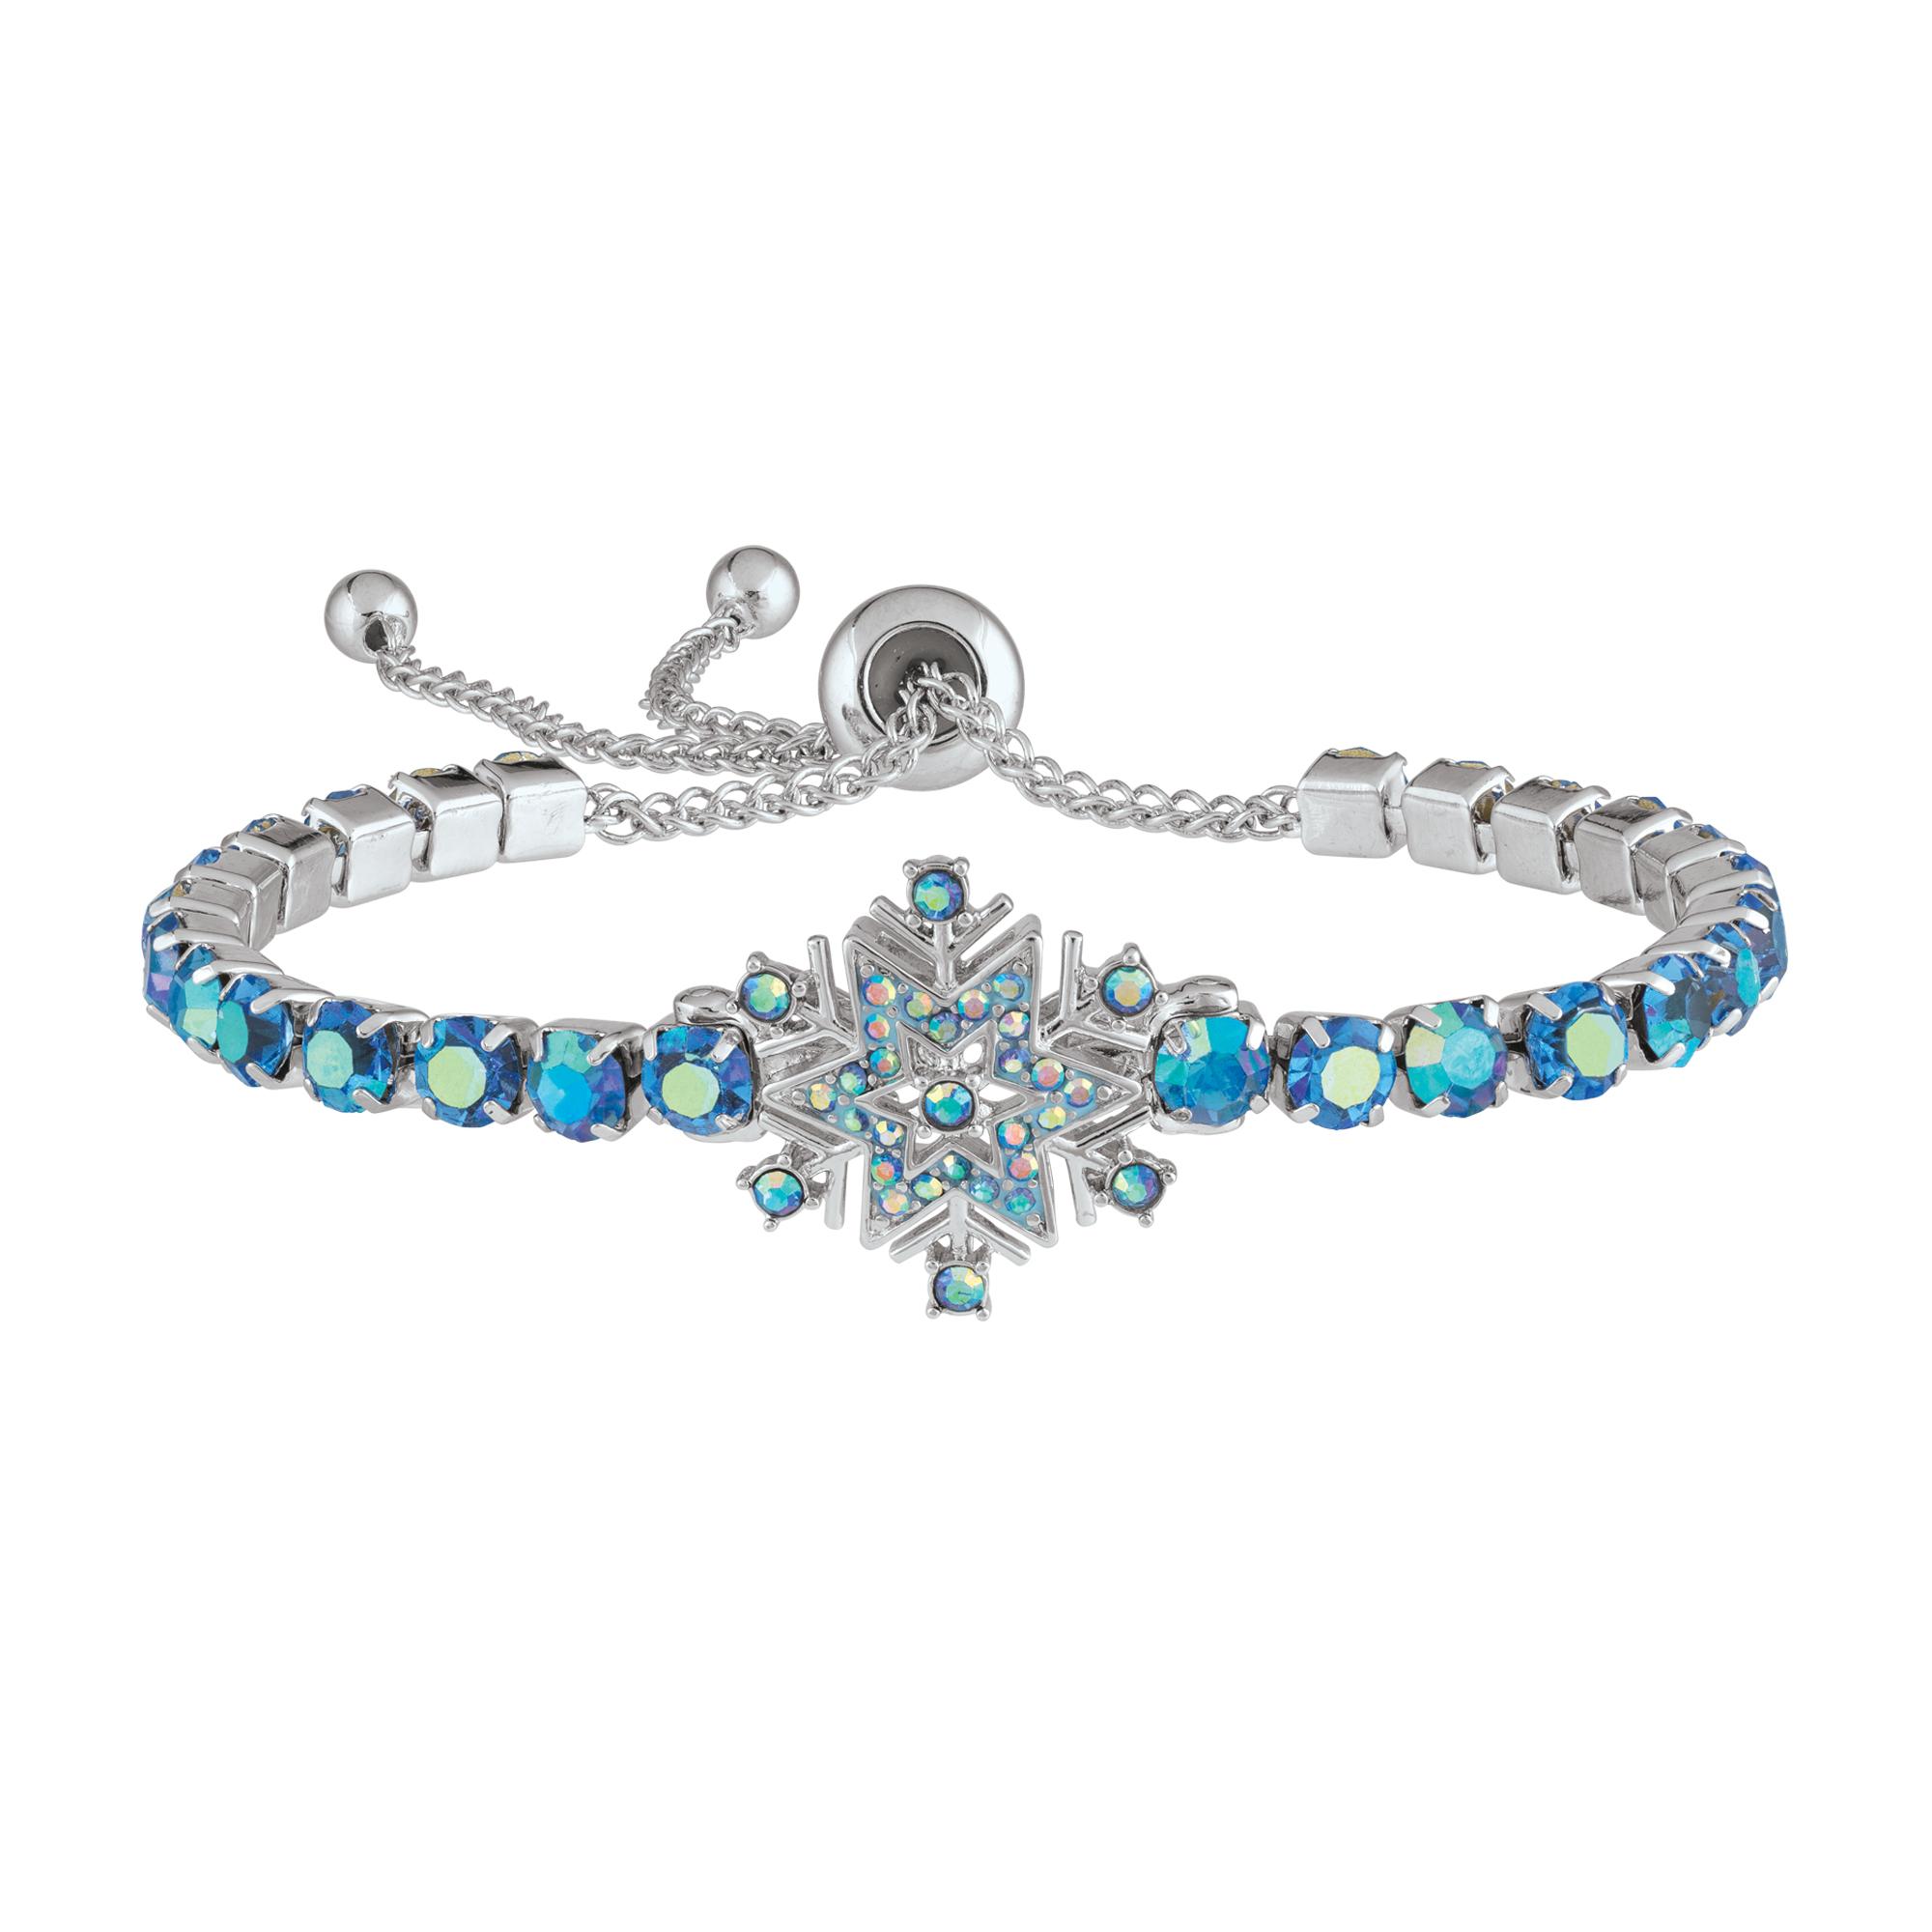 March Birthstone Bracelet Aquamarine Bracelet Blue Bracelet Tennis Bracelet Crystal Bracelet Christmas Gift for Her